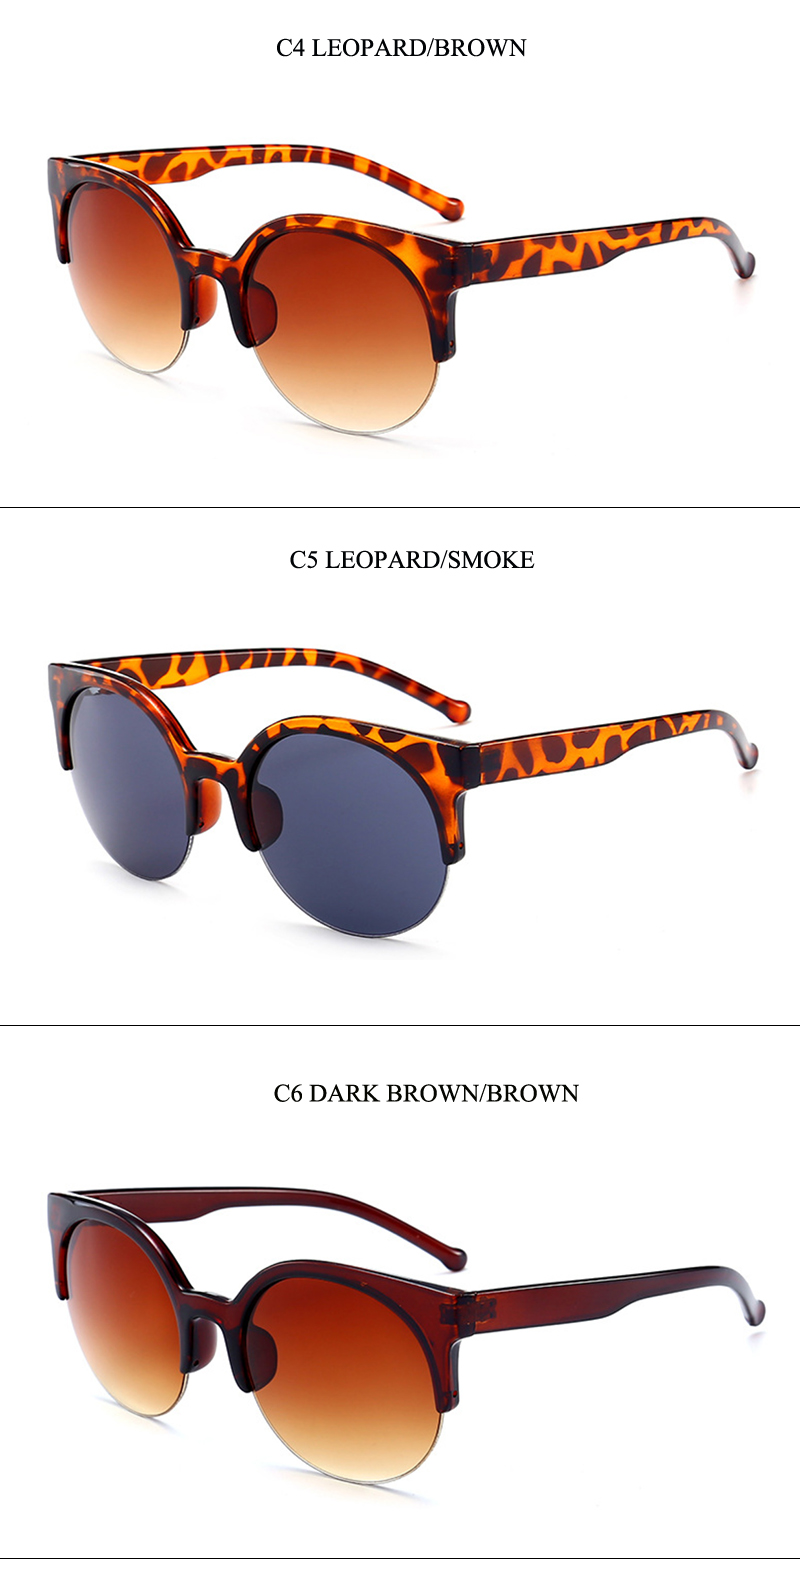 7 semi-rimless women sunglasses